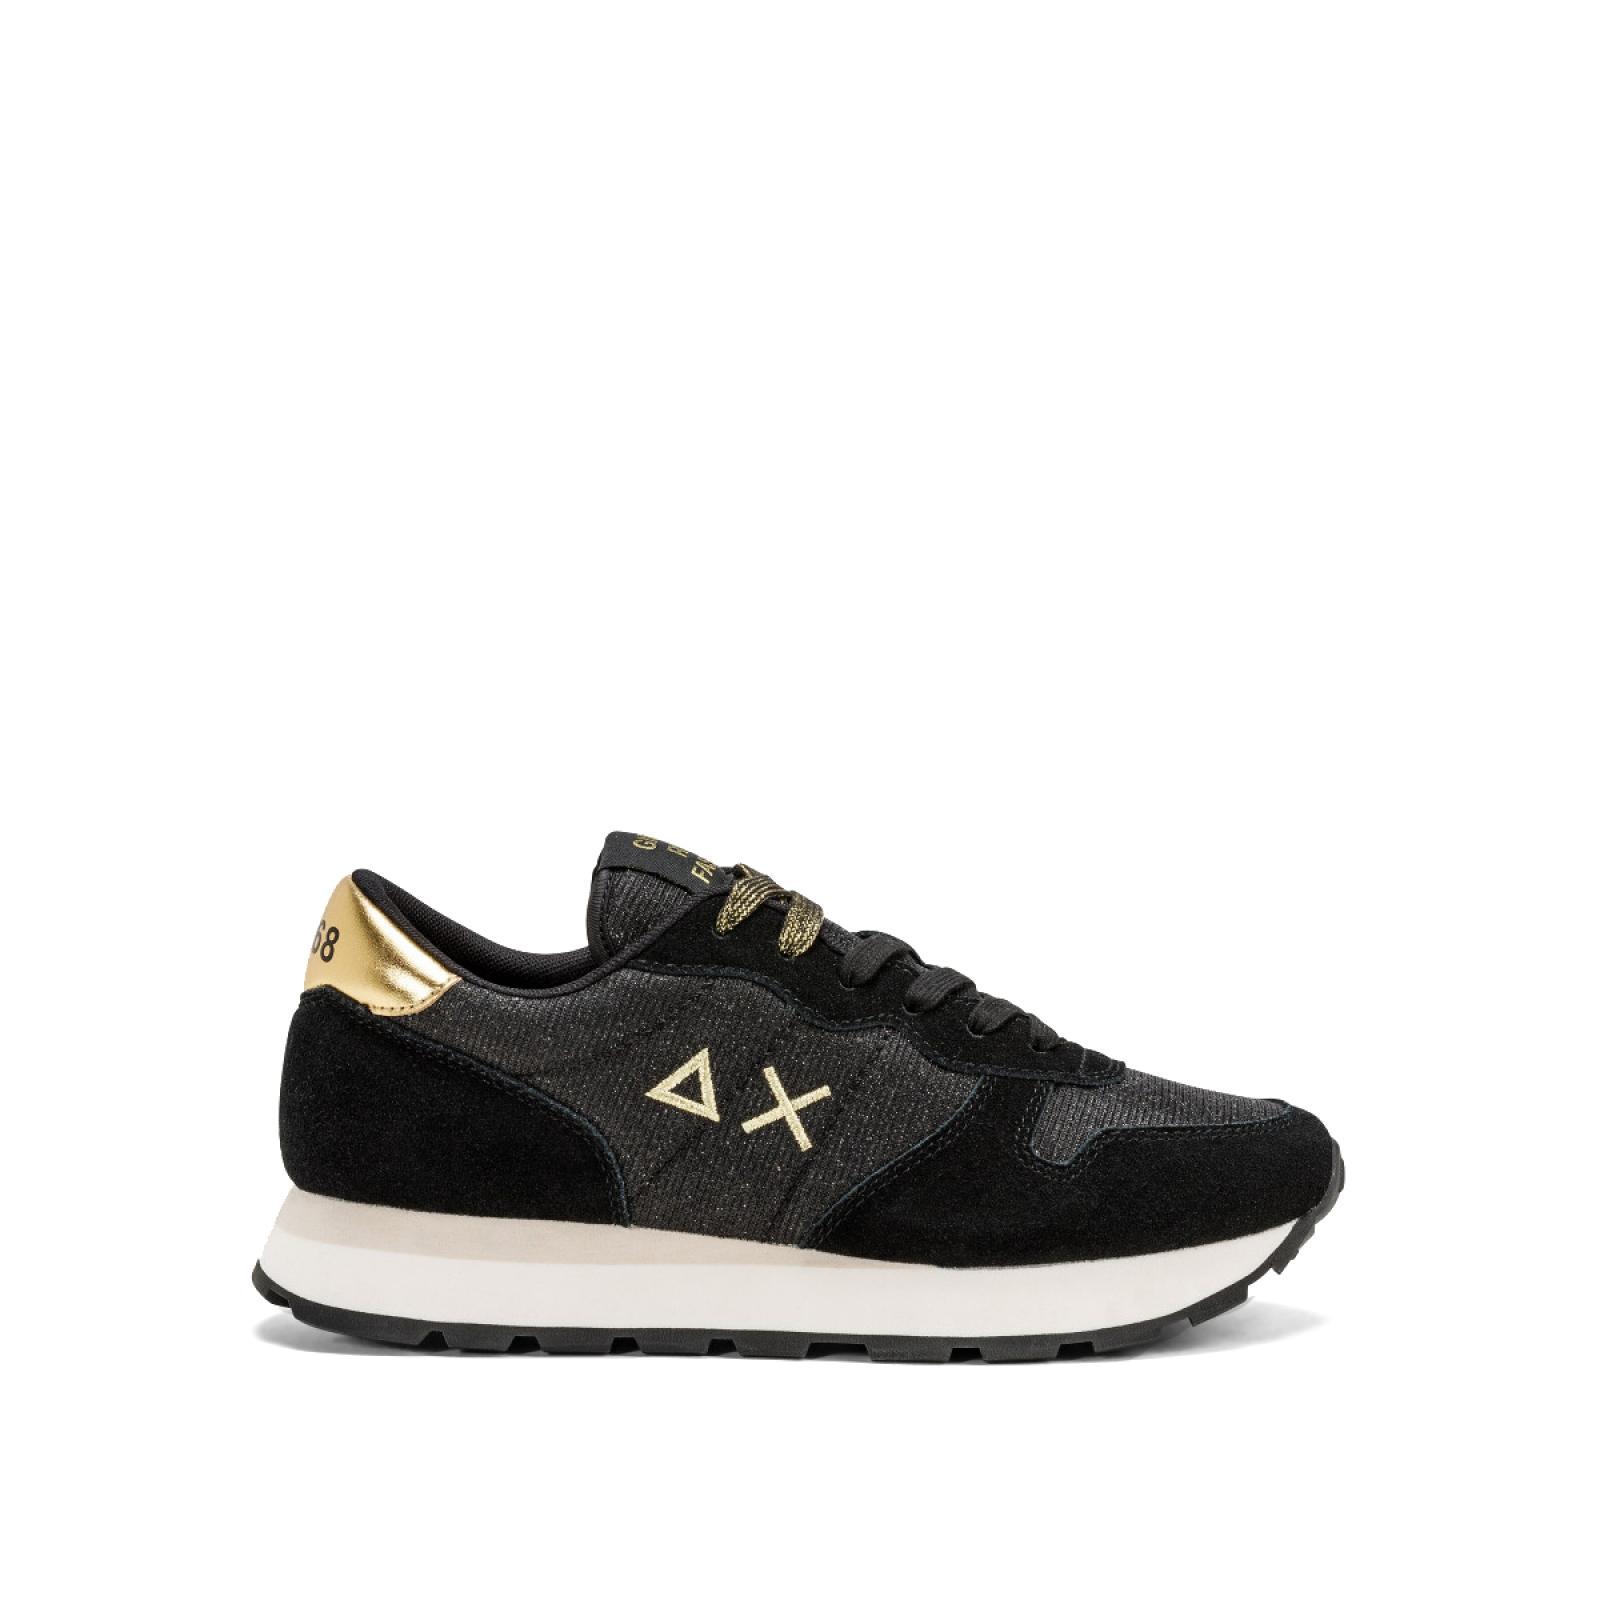 Sun68 Sneakers Ally Thin Glitter - 1